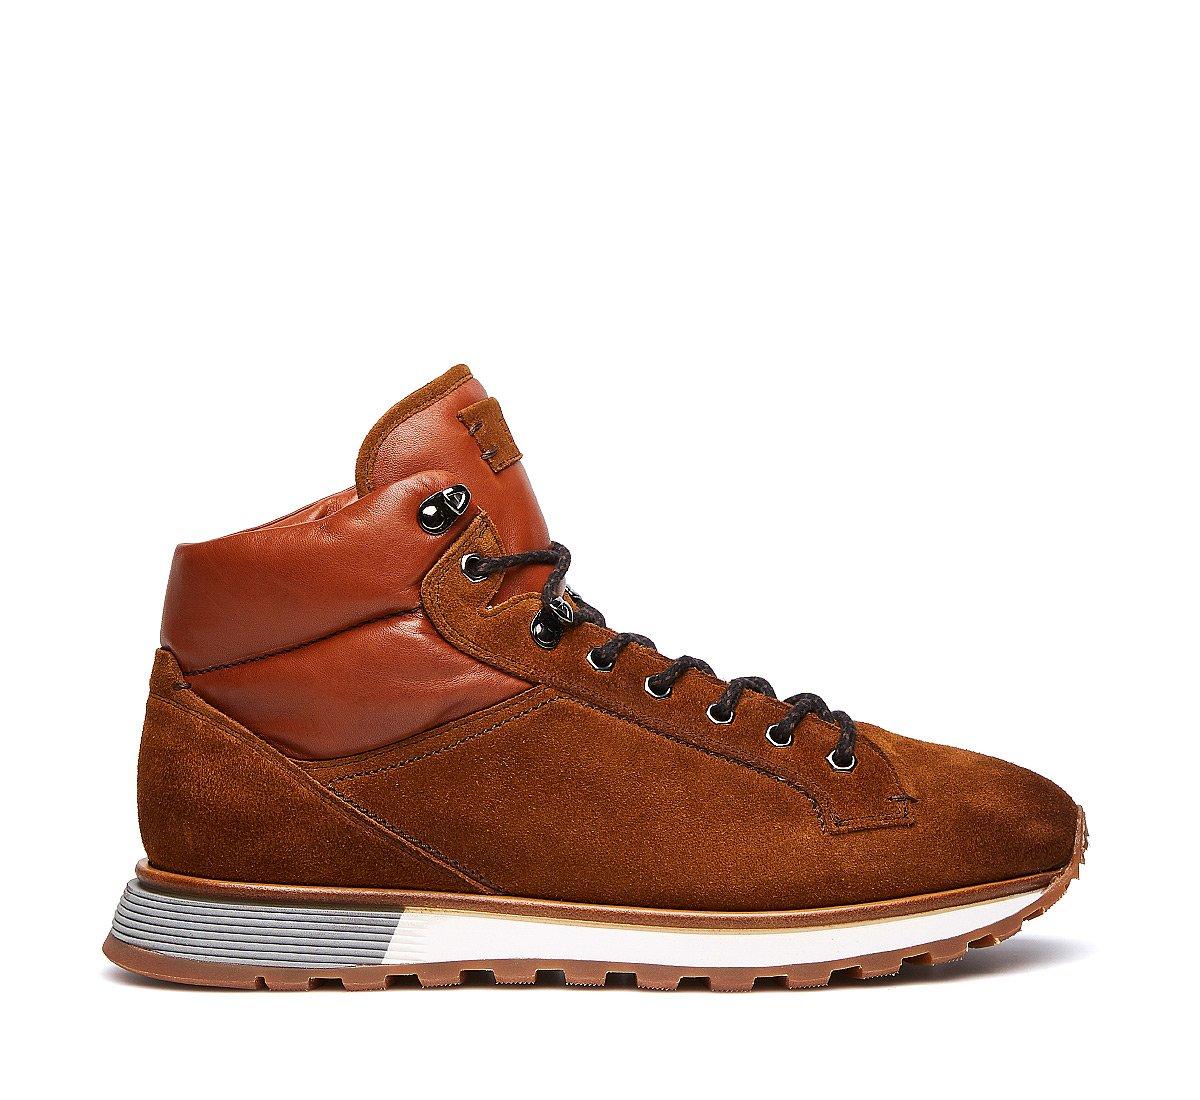 Miramonti boots in soft calfskin